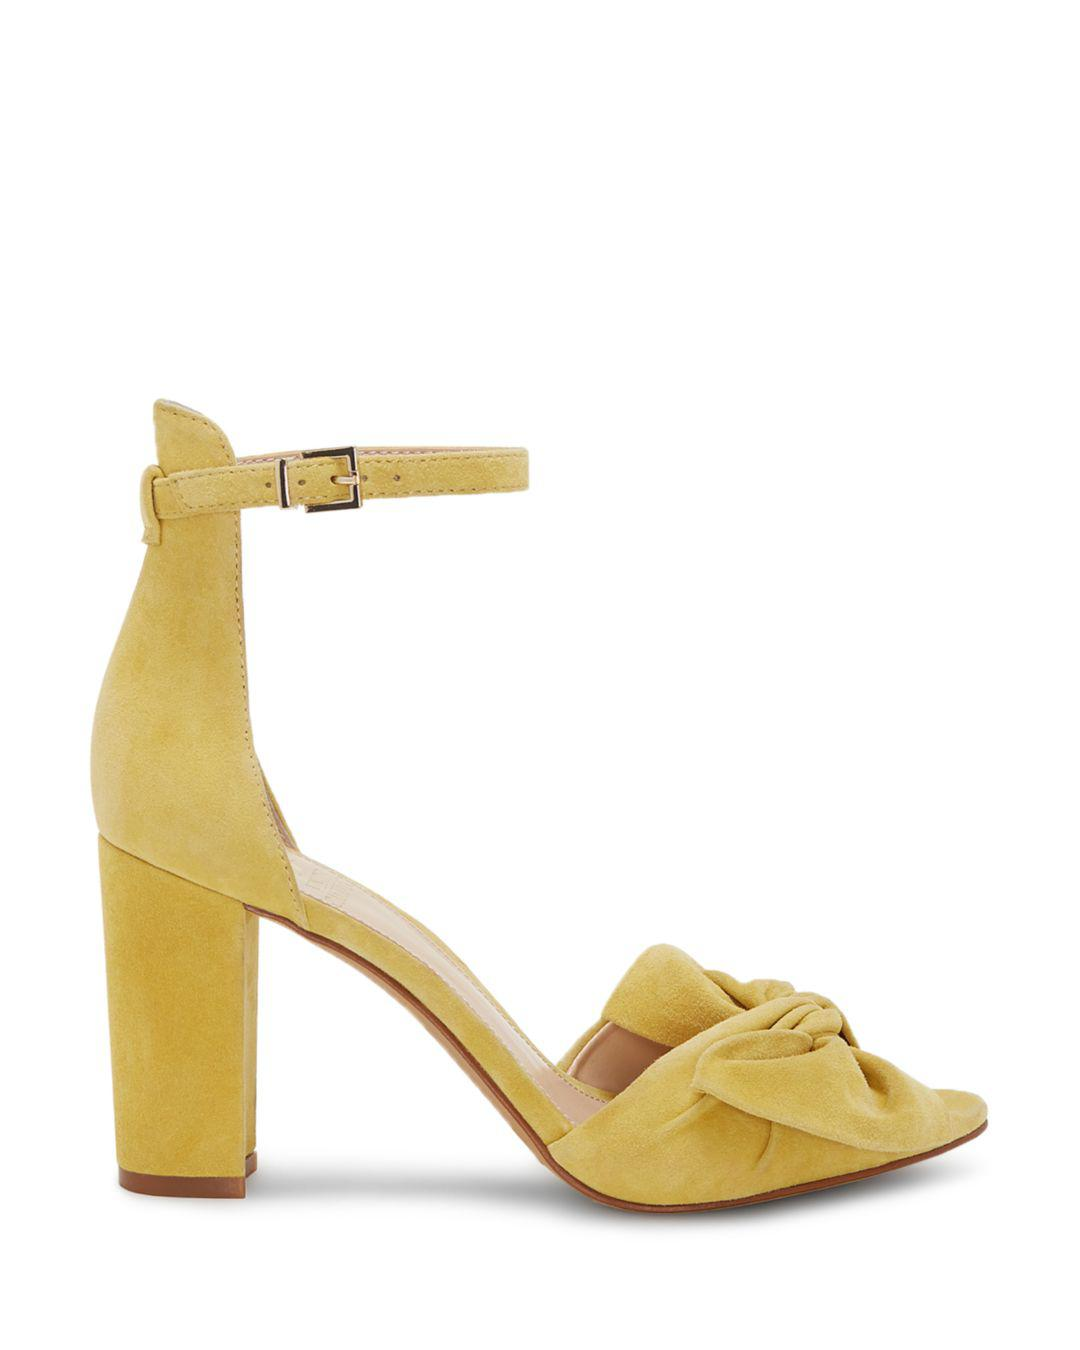 4080750f5390 Lyst - Vince Camuto Carrelen Block Heel Sandal (women) in Yellow